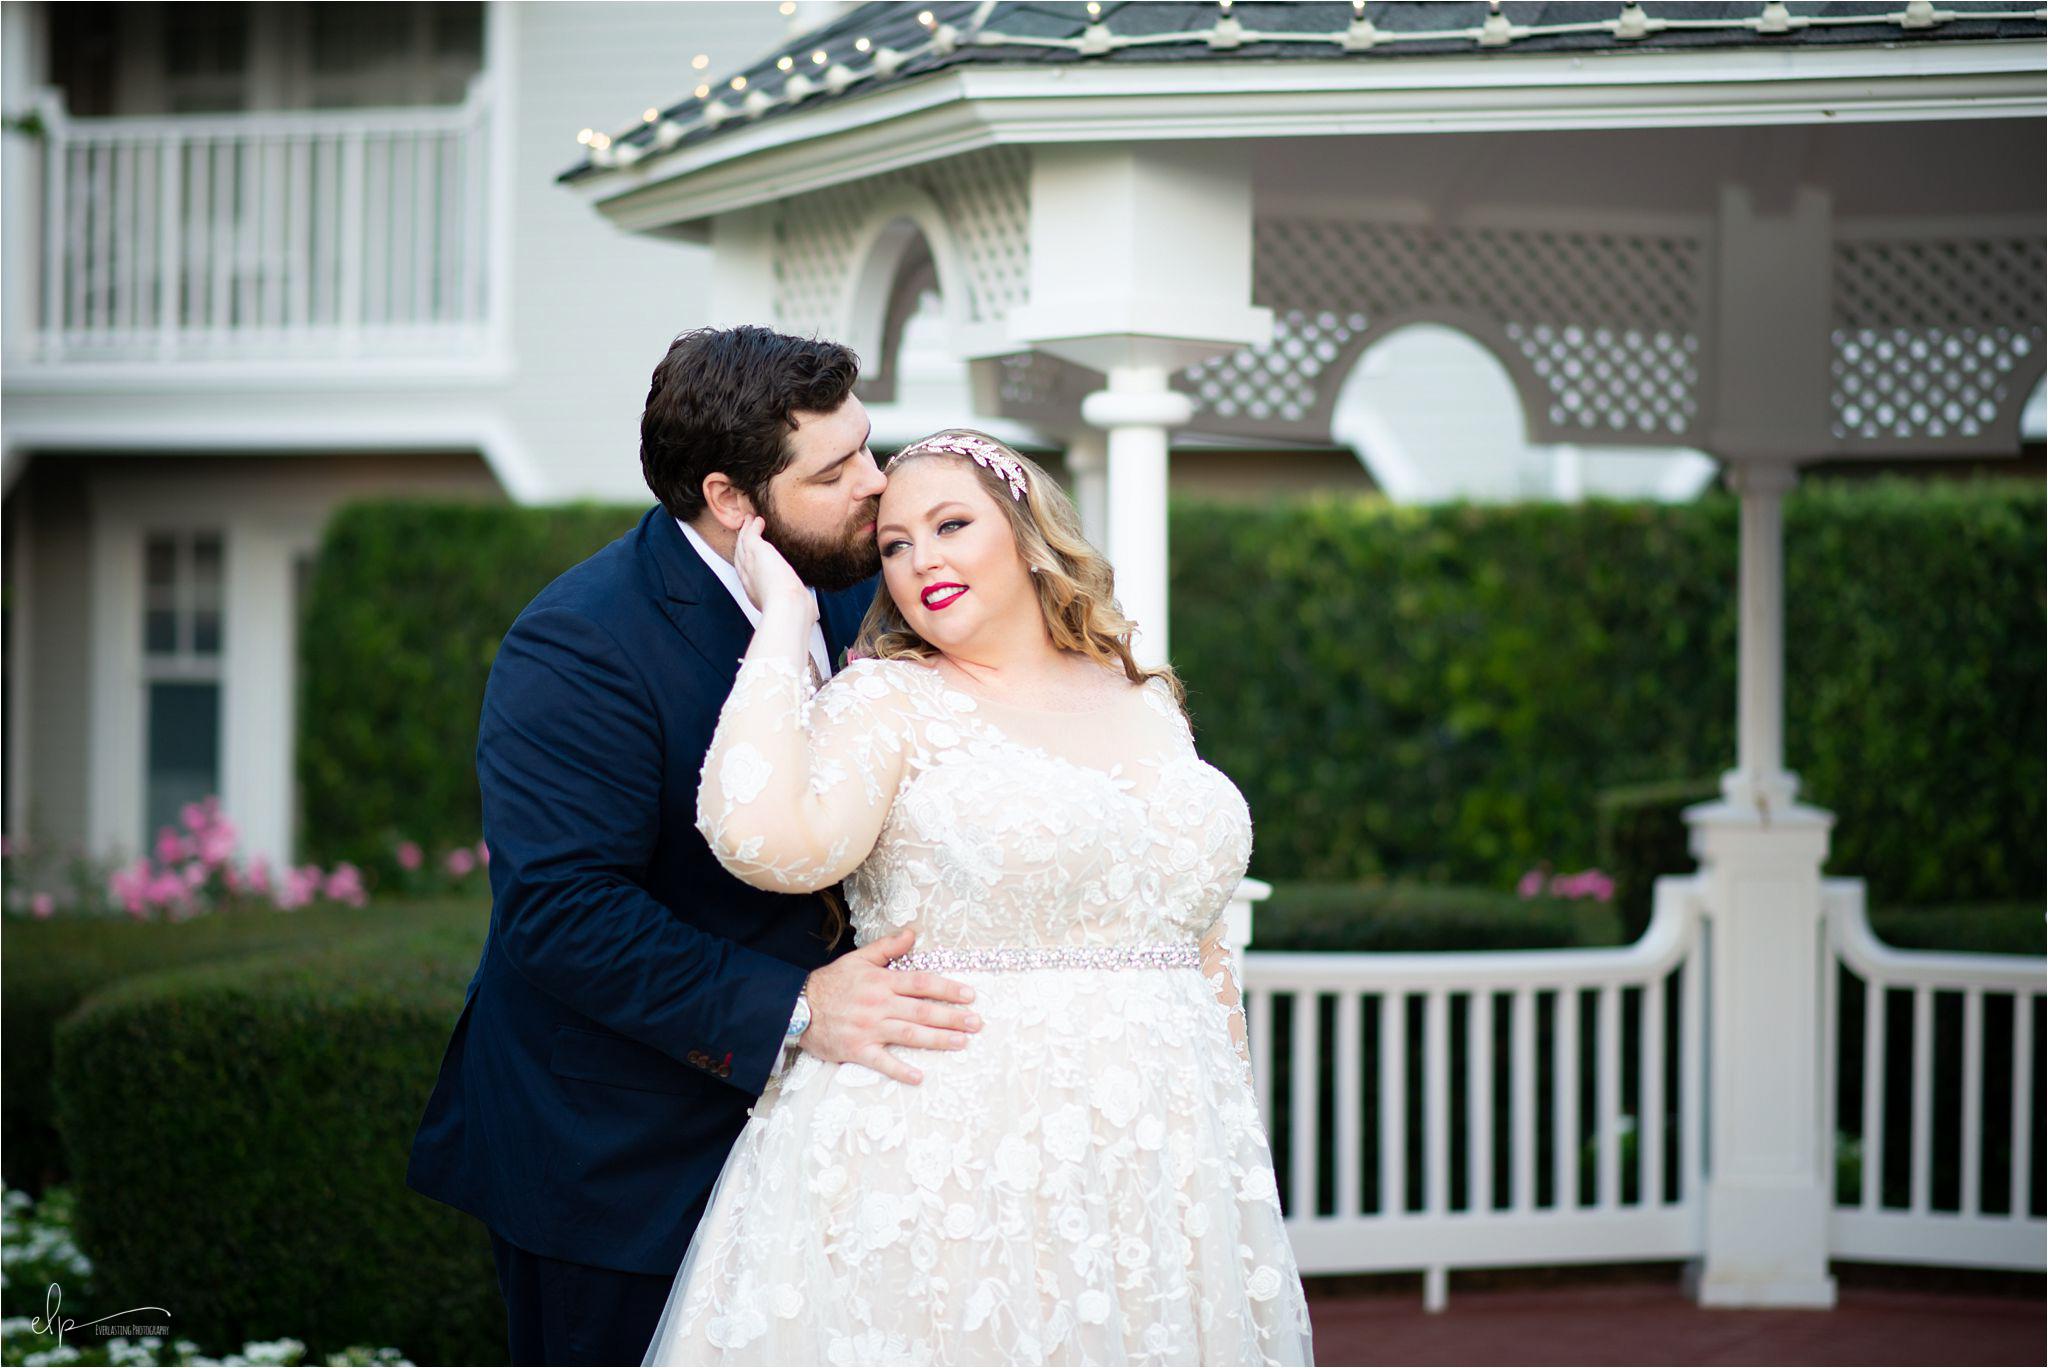 Orlando wedding photography at Disney